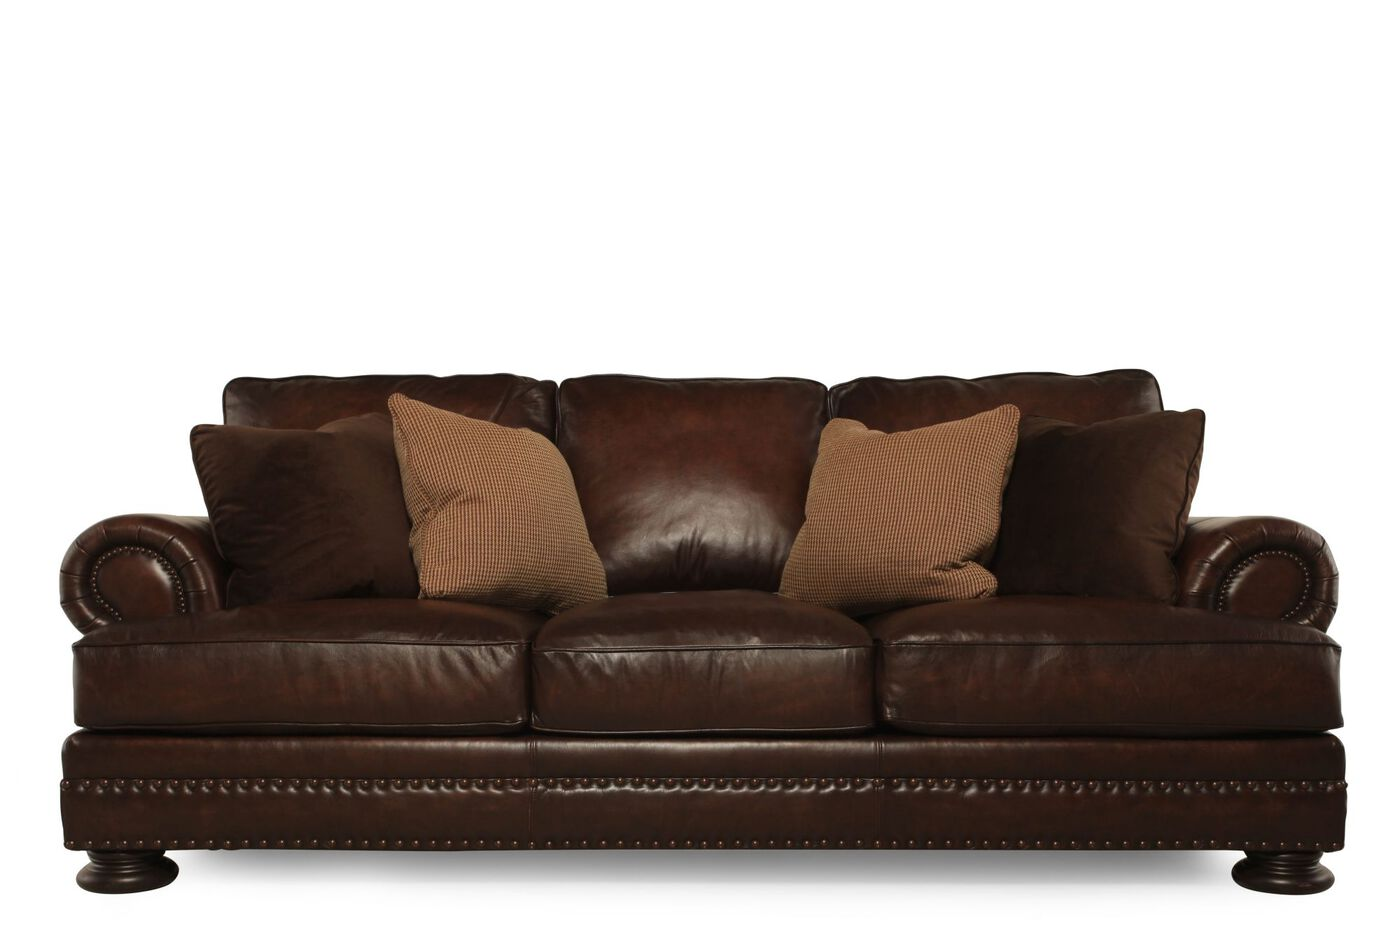 Bernhardt Leather Sofas  U2013 Thesofa